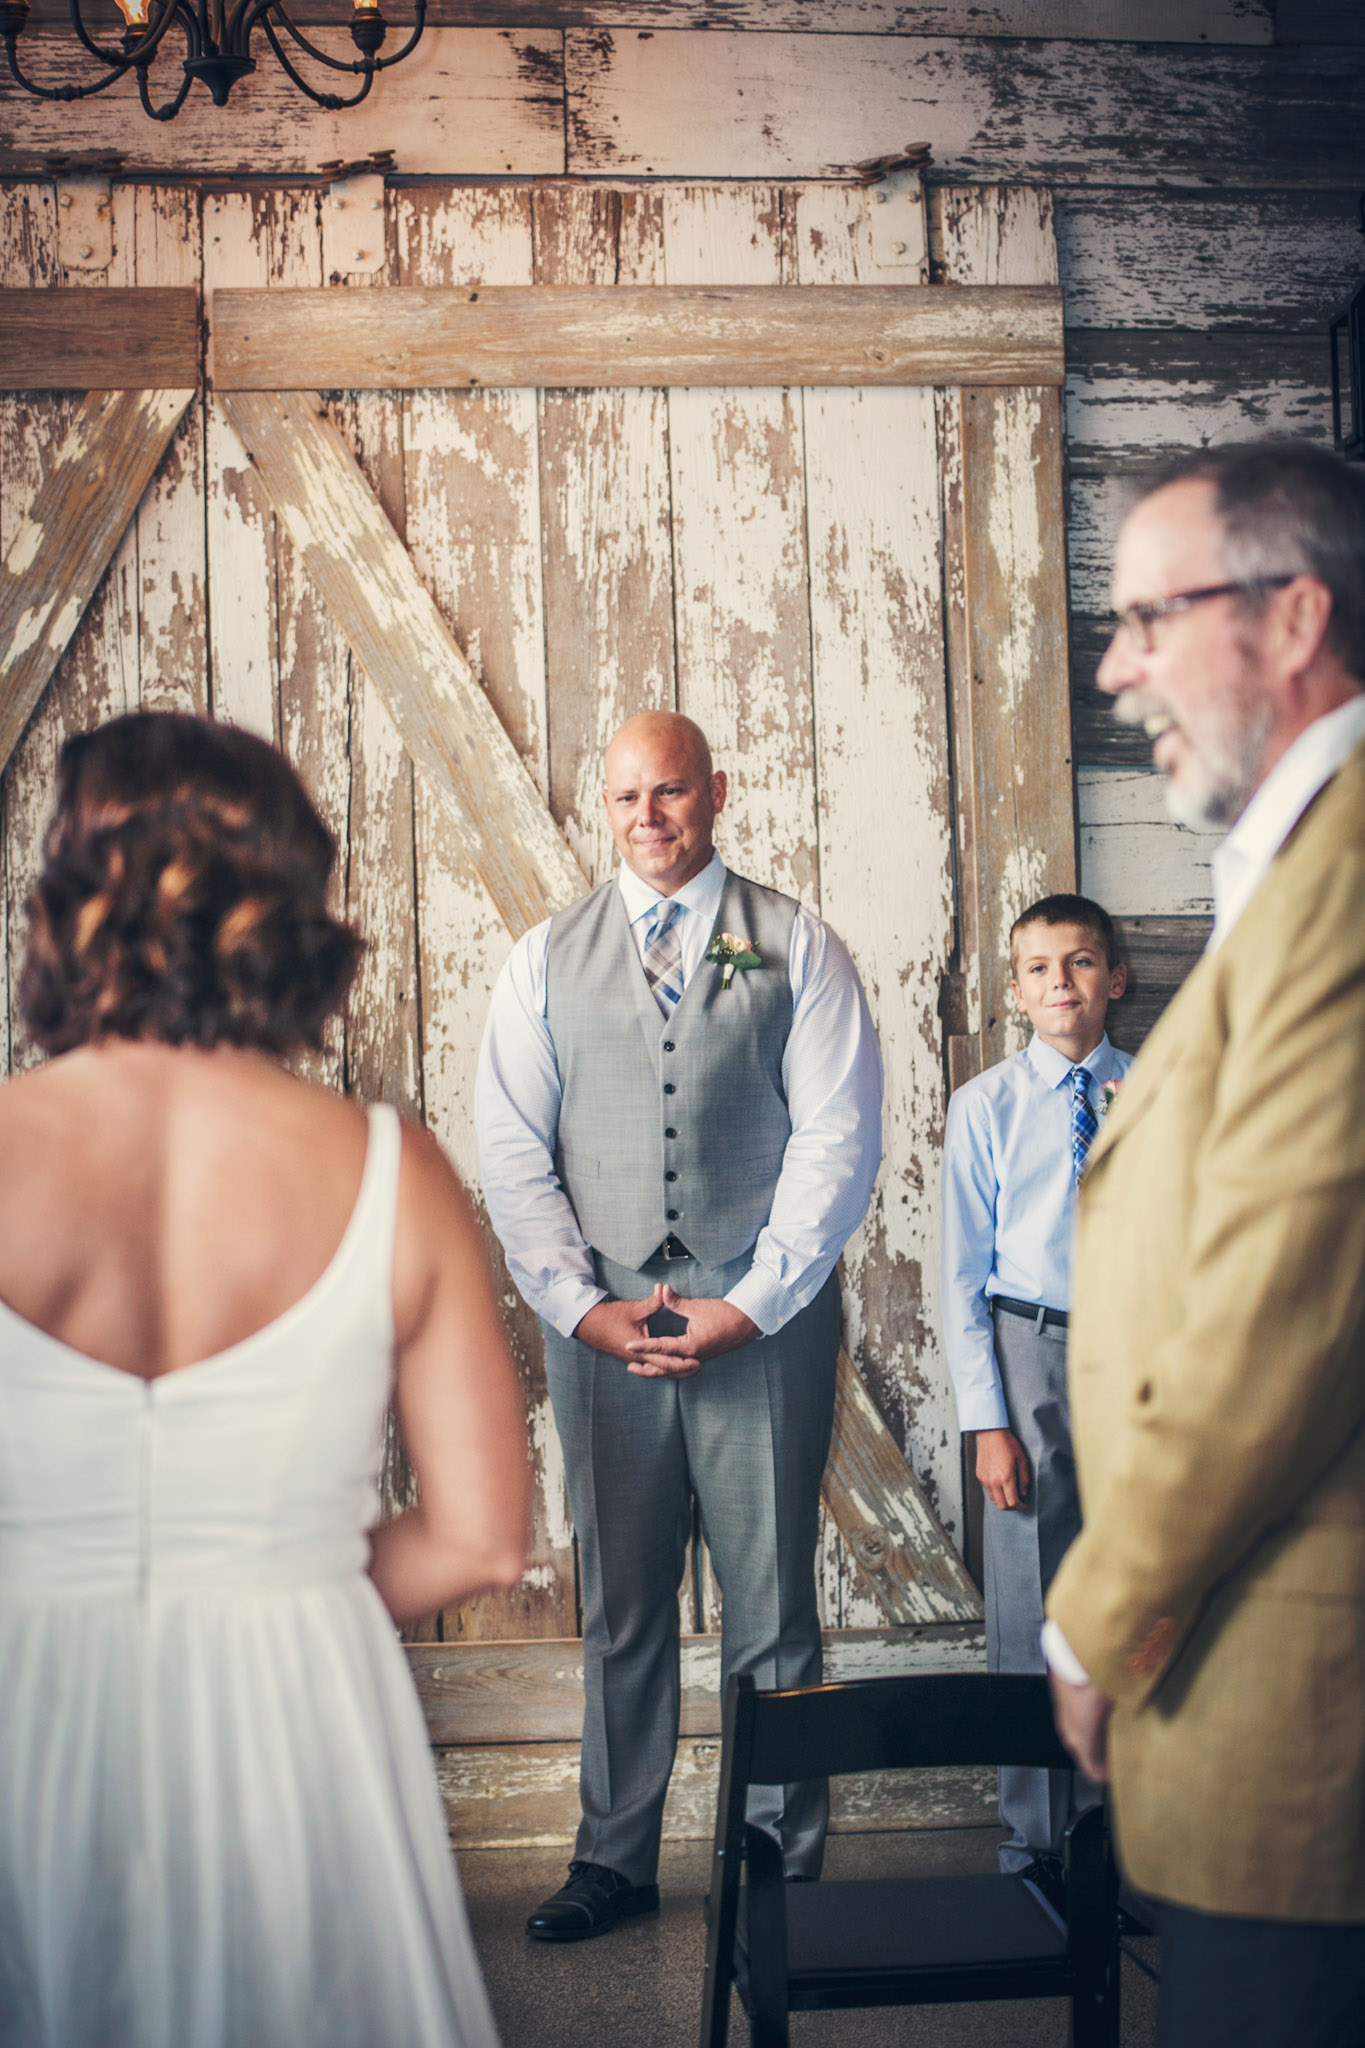 The_Vow_Exchange_Kansas_City_Small_Budget_Wedding_Venue_Lisa & John_041b.jpg